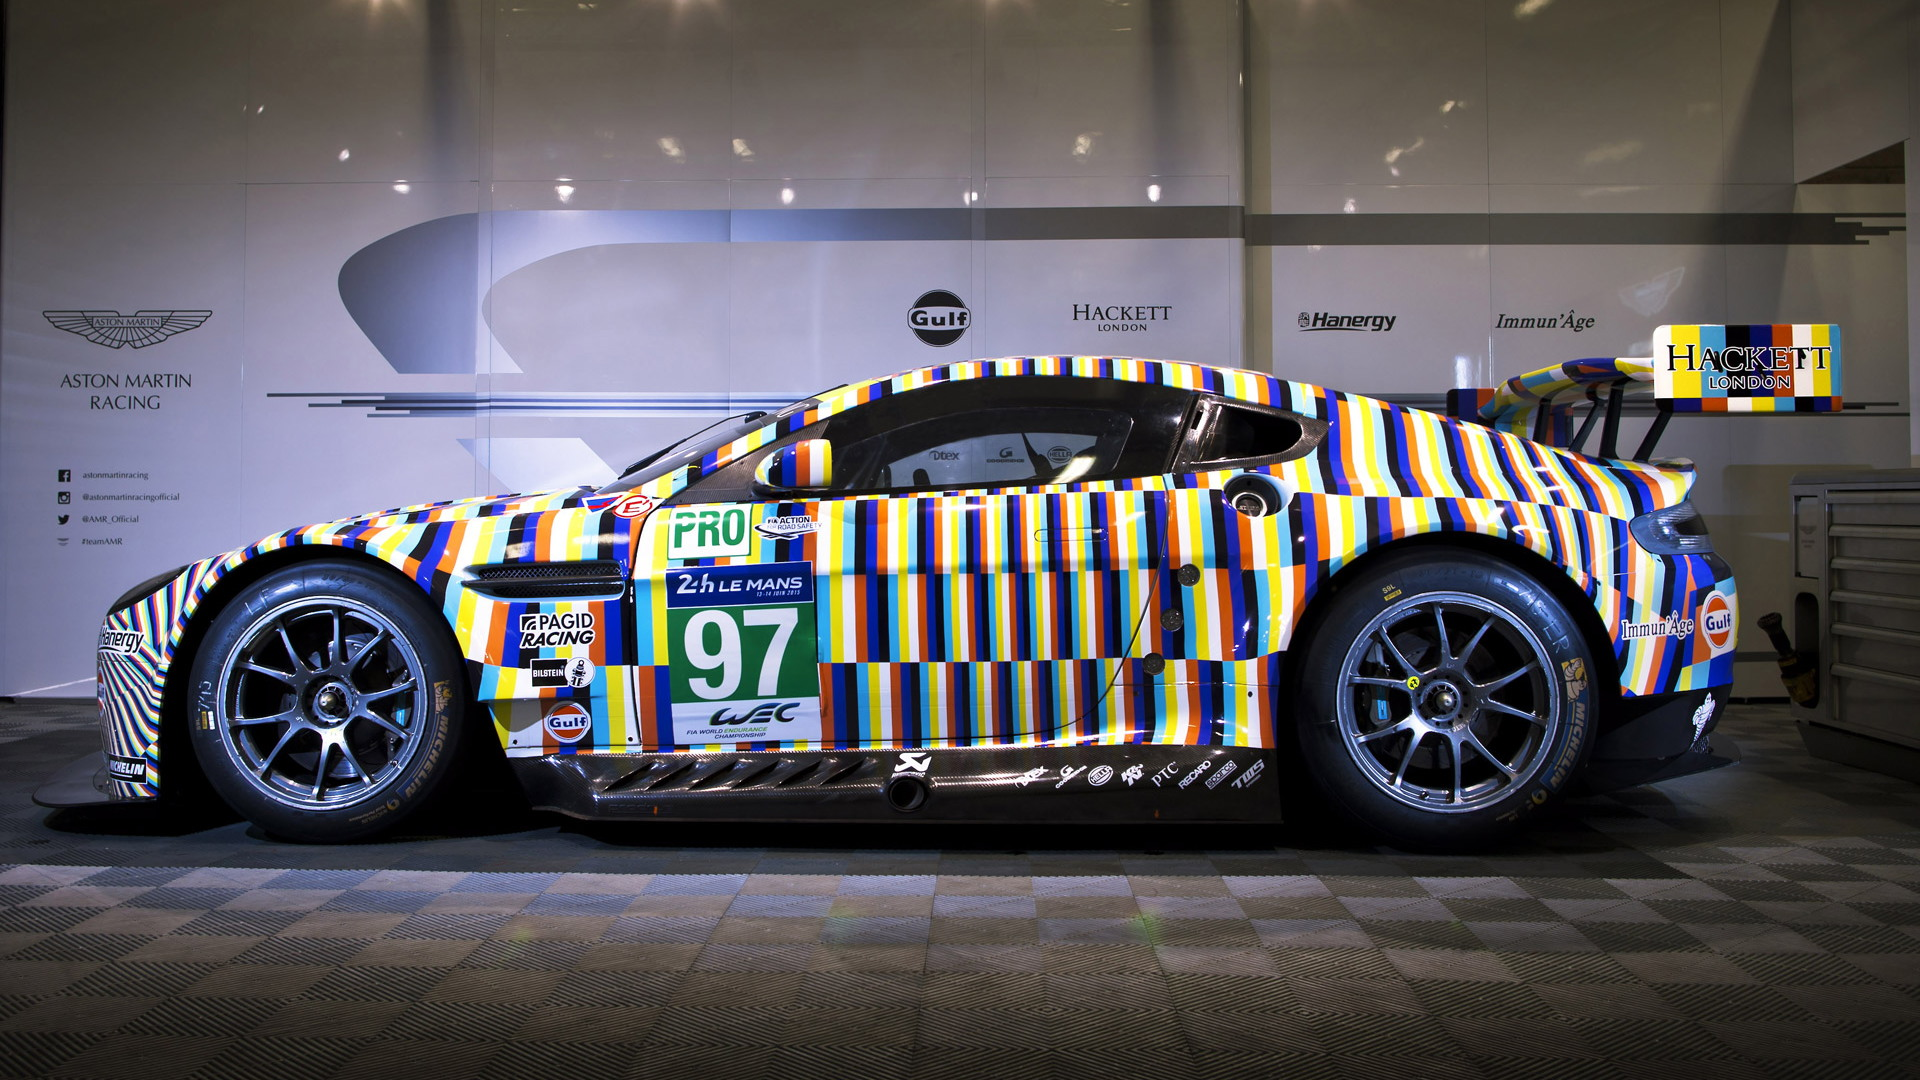 2015 Aston Martin Vantage GTE art car by Tobias Rahberger